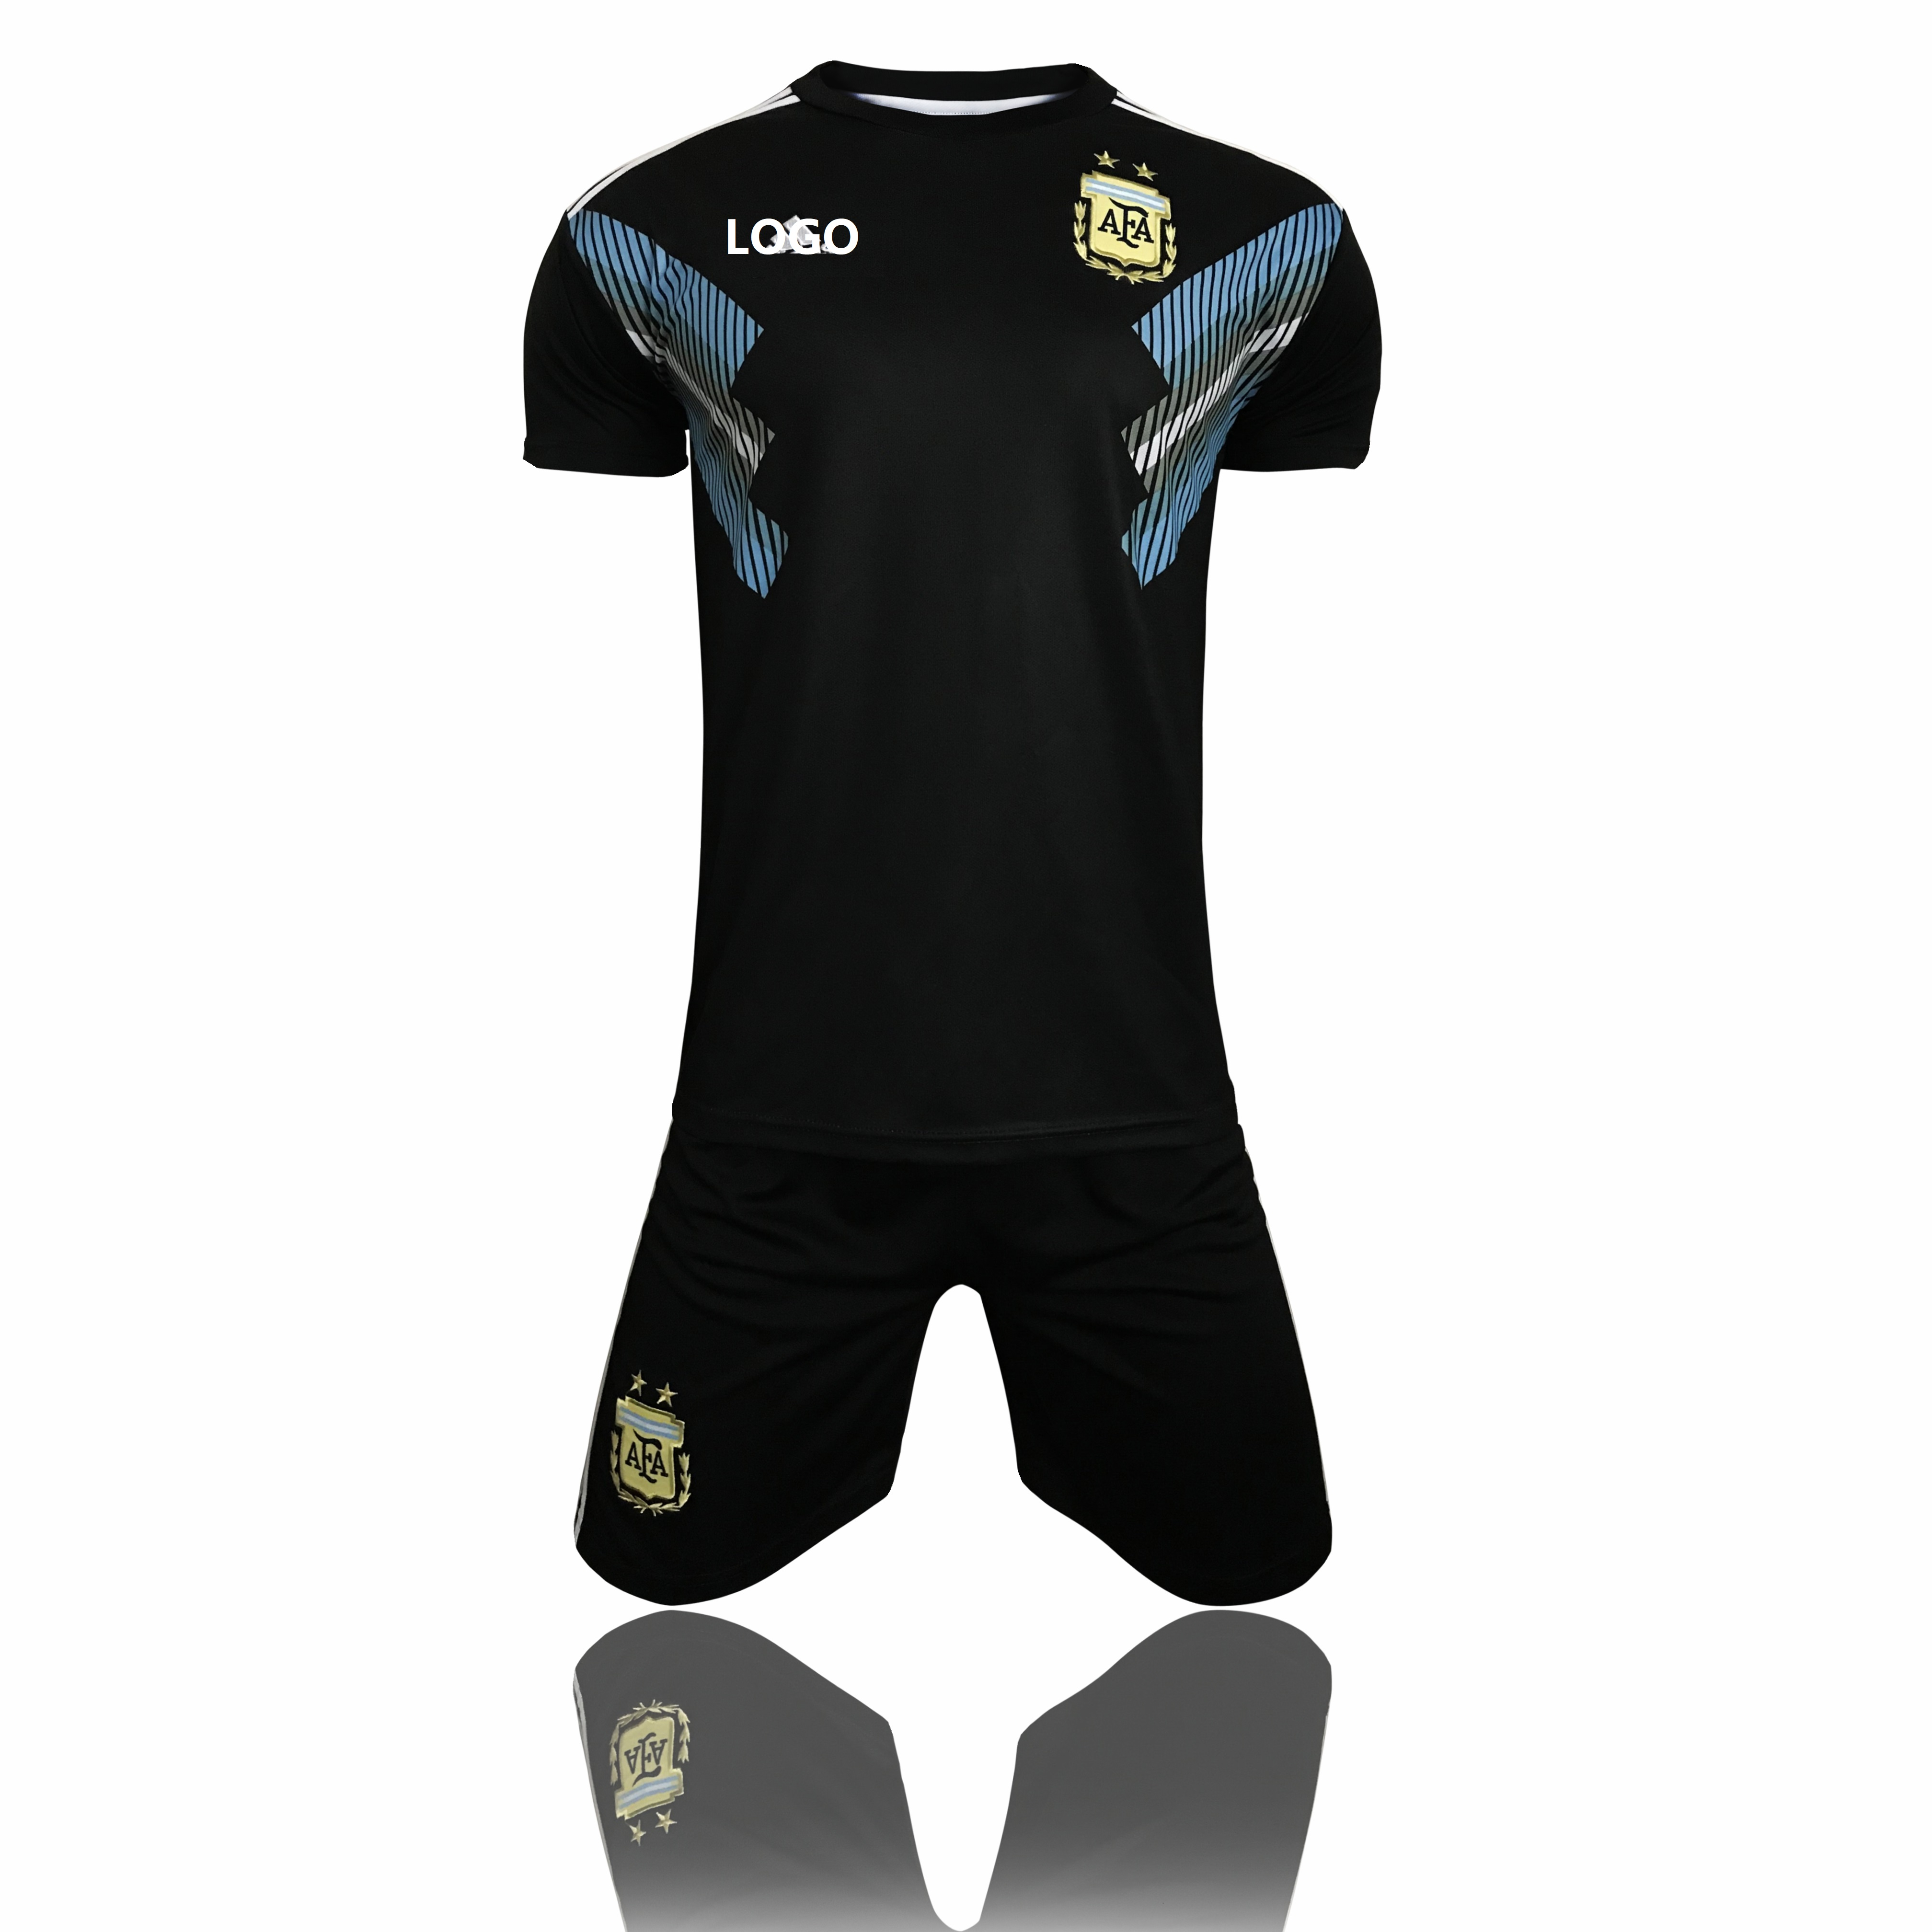 ec5e3361223 2018 Kids Russia Argentina Away Soccer Uniforms Children Football Kits Item  NO  493539